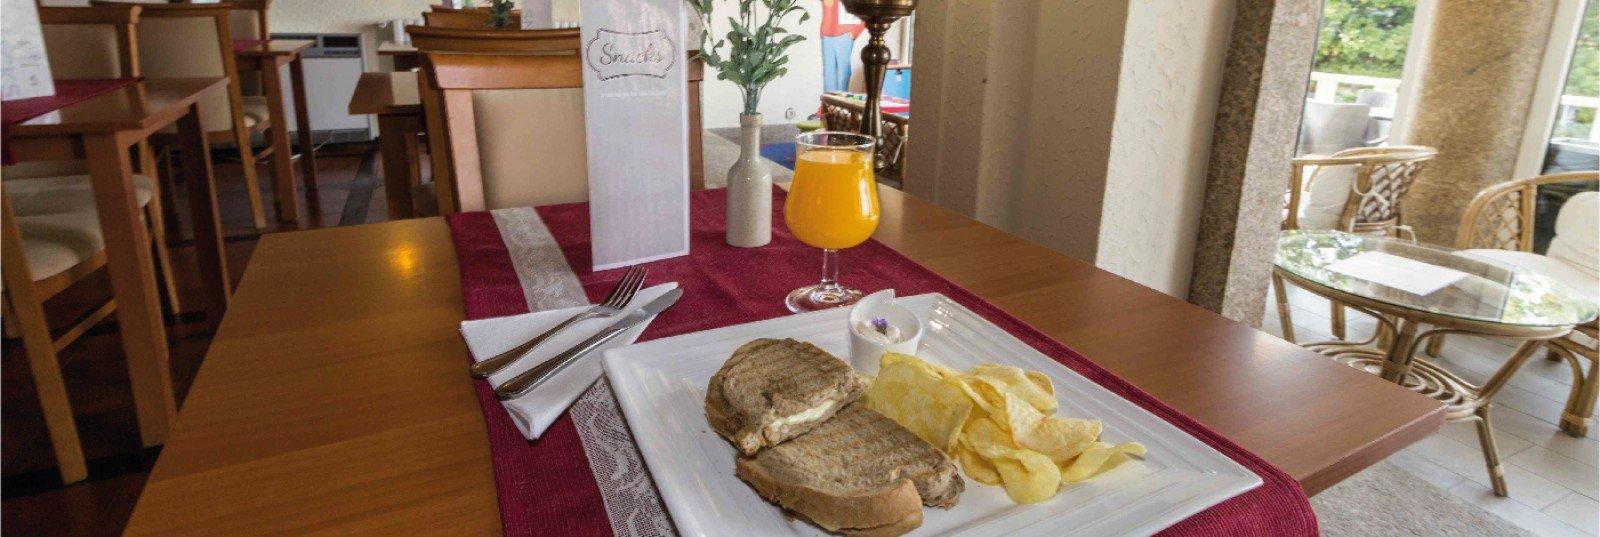 Hotel Eurosol Gouveia - bar Terrace